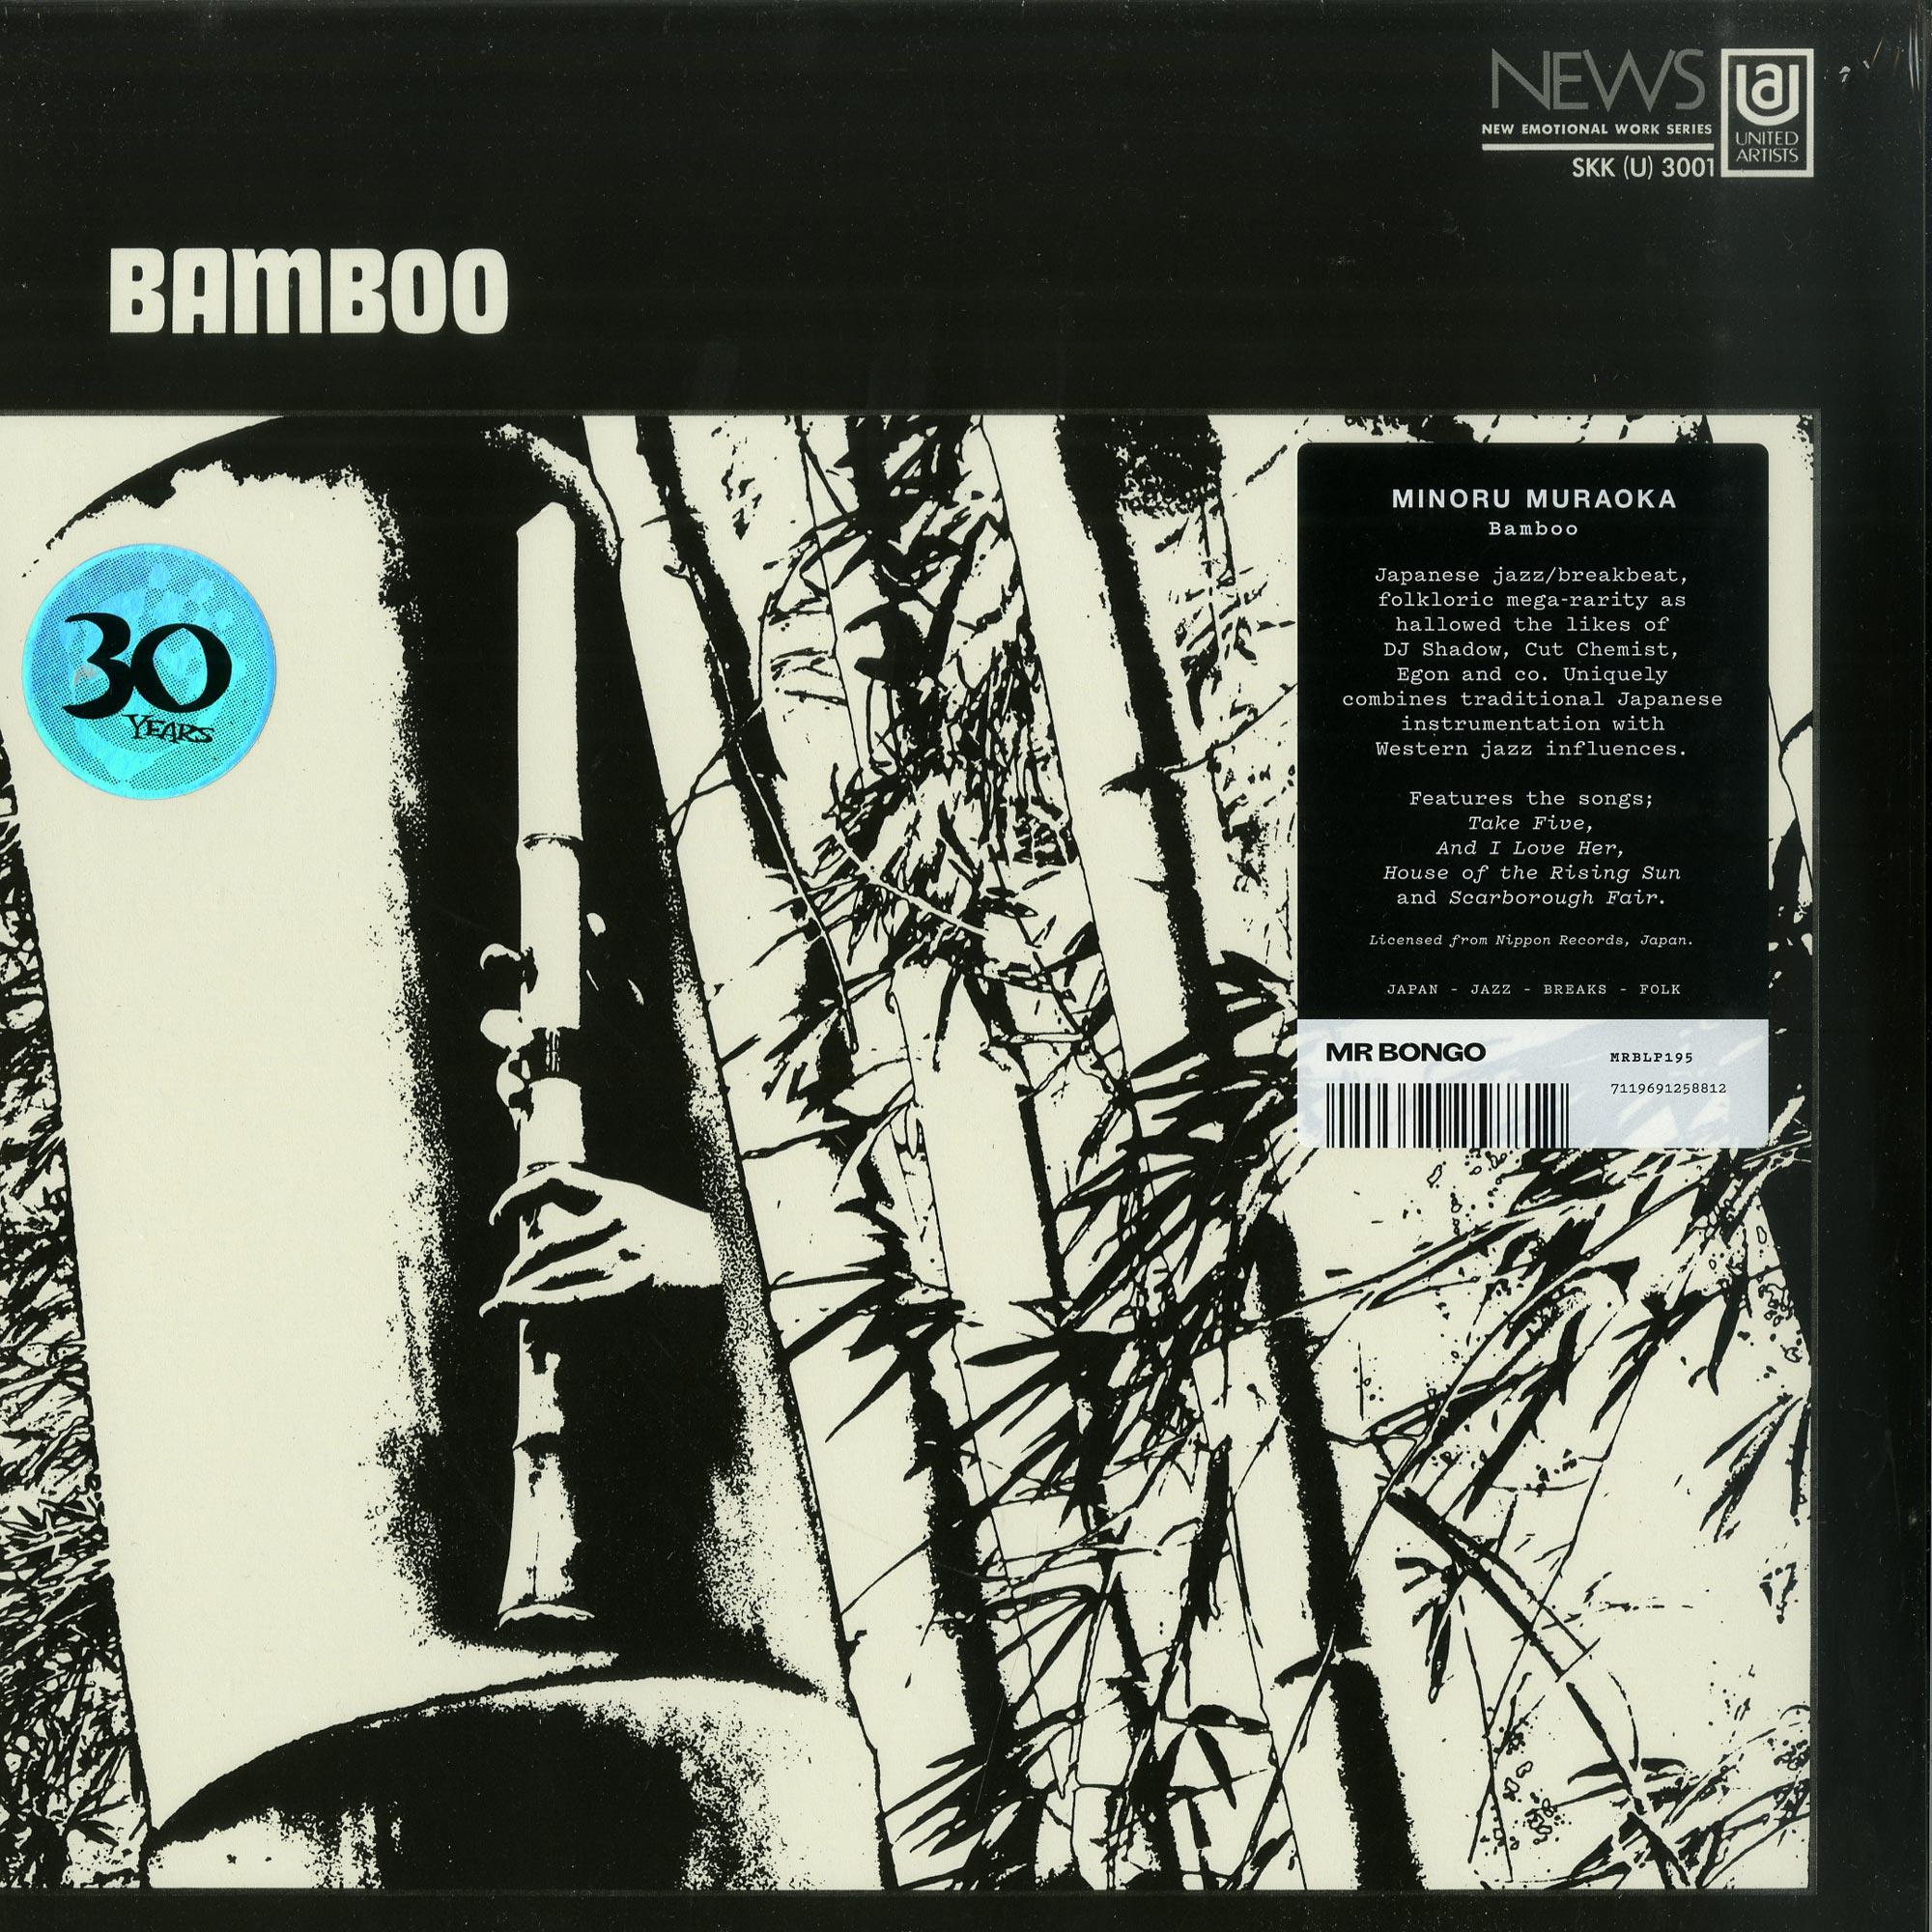 Minoru Muraoka - BAMBOO